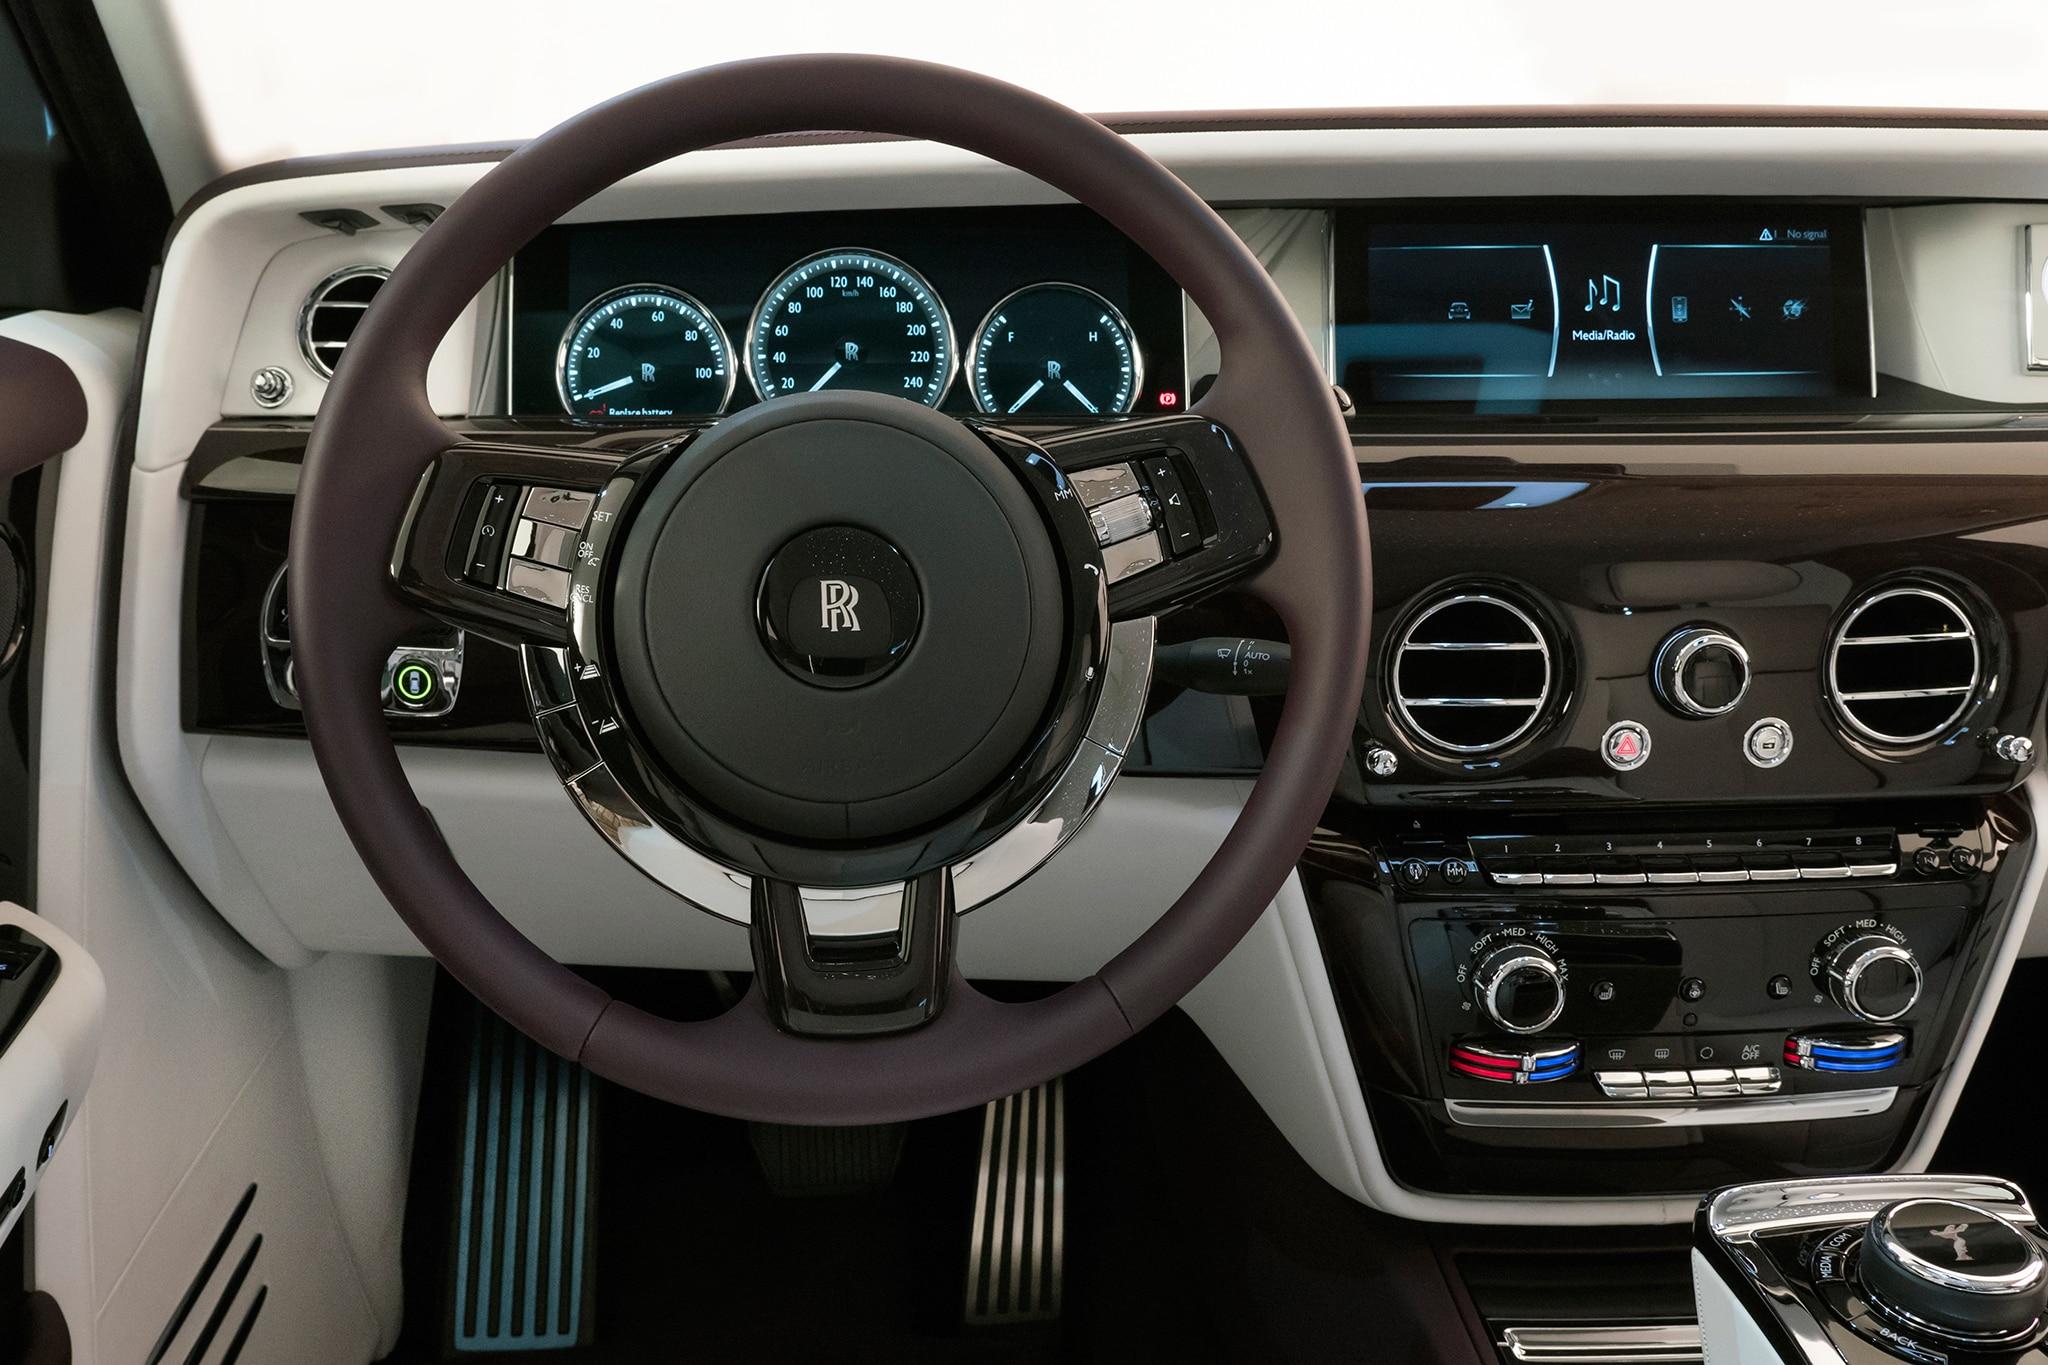 2018 Rolls Royce Phantom Viii Wordlesstech - Jidiworkout.co 336f1d050